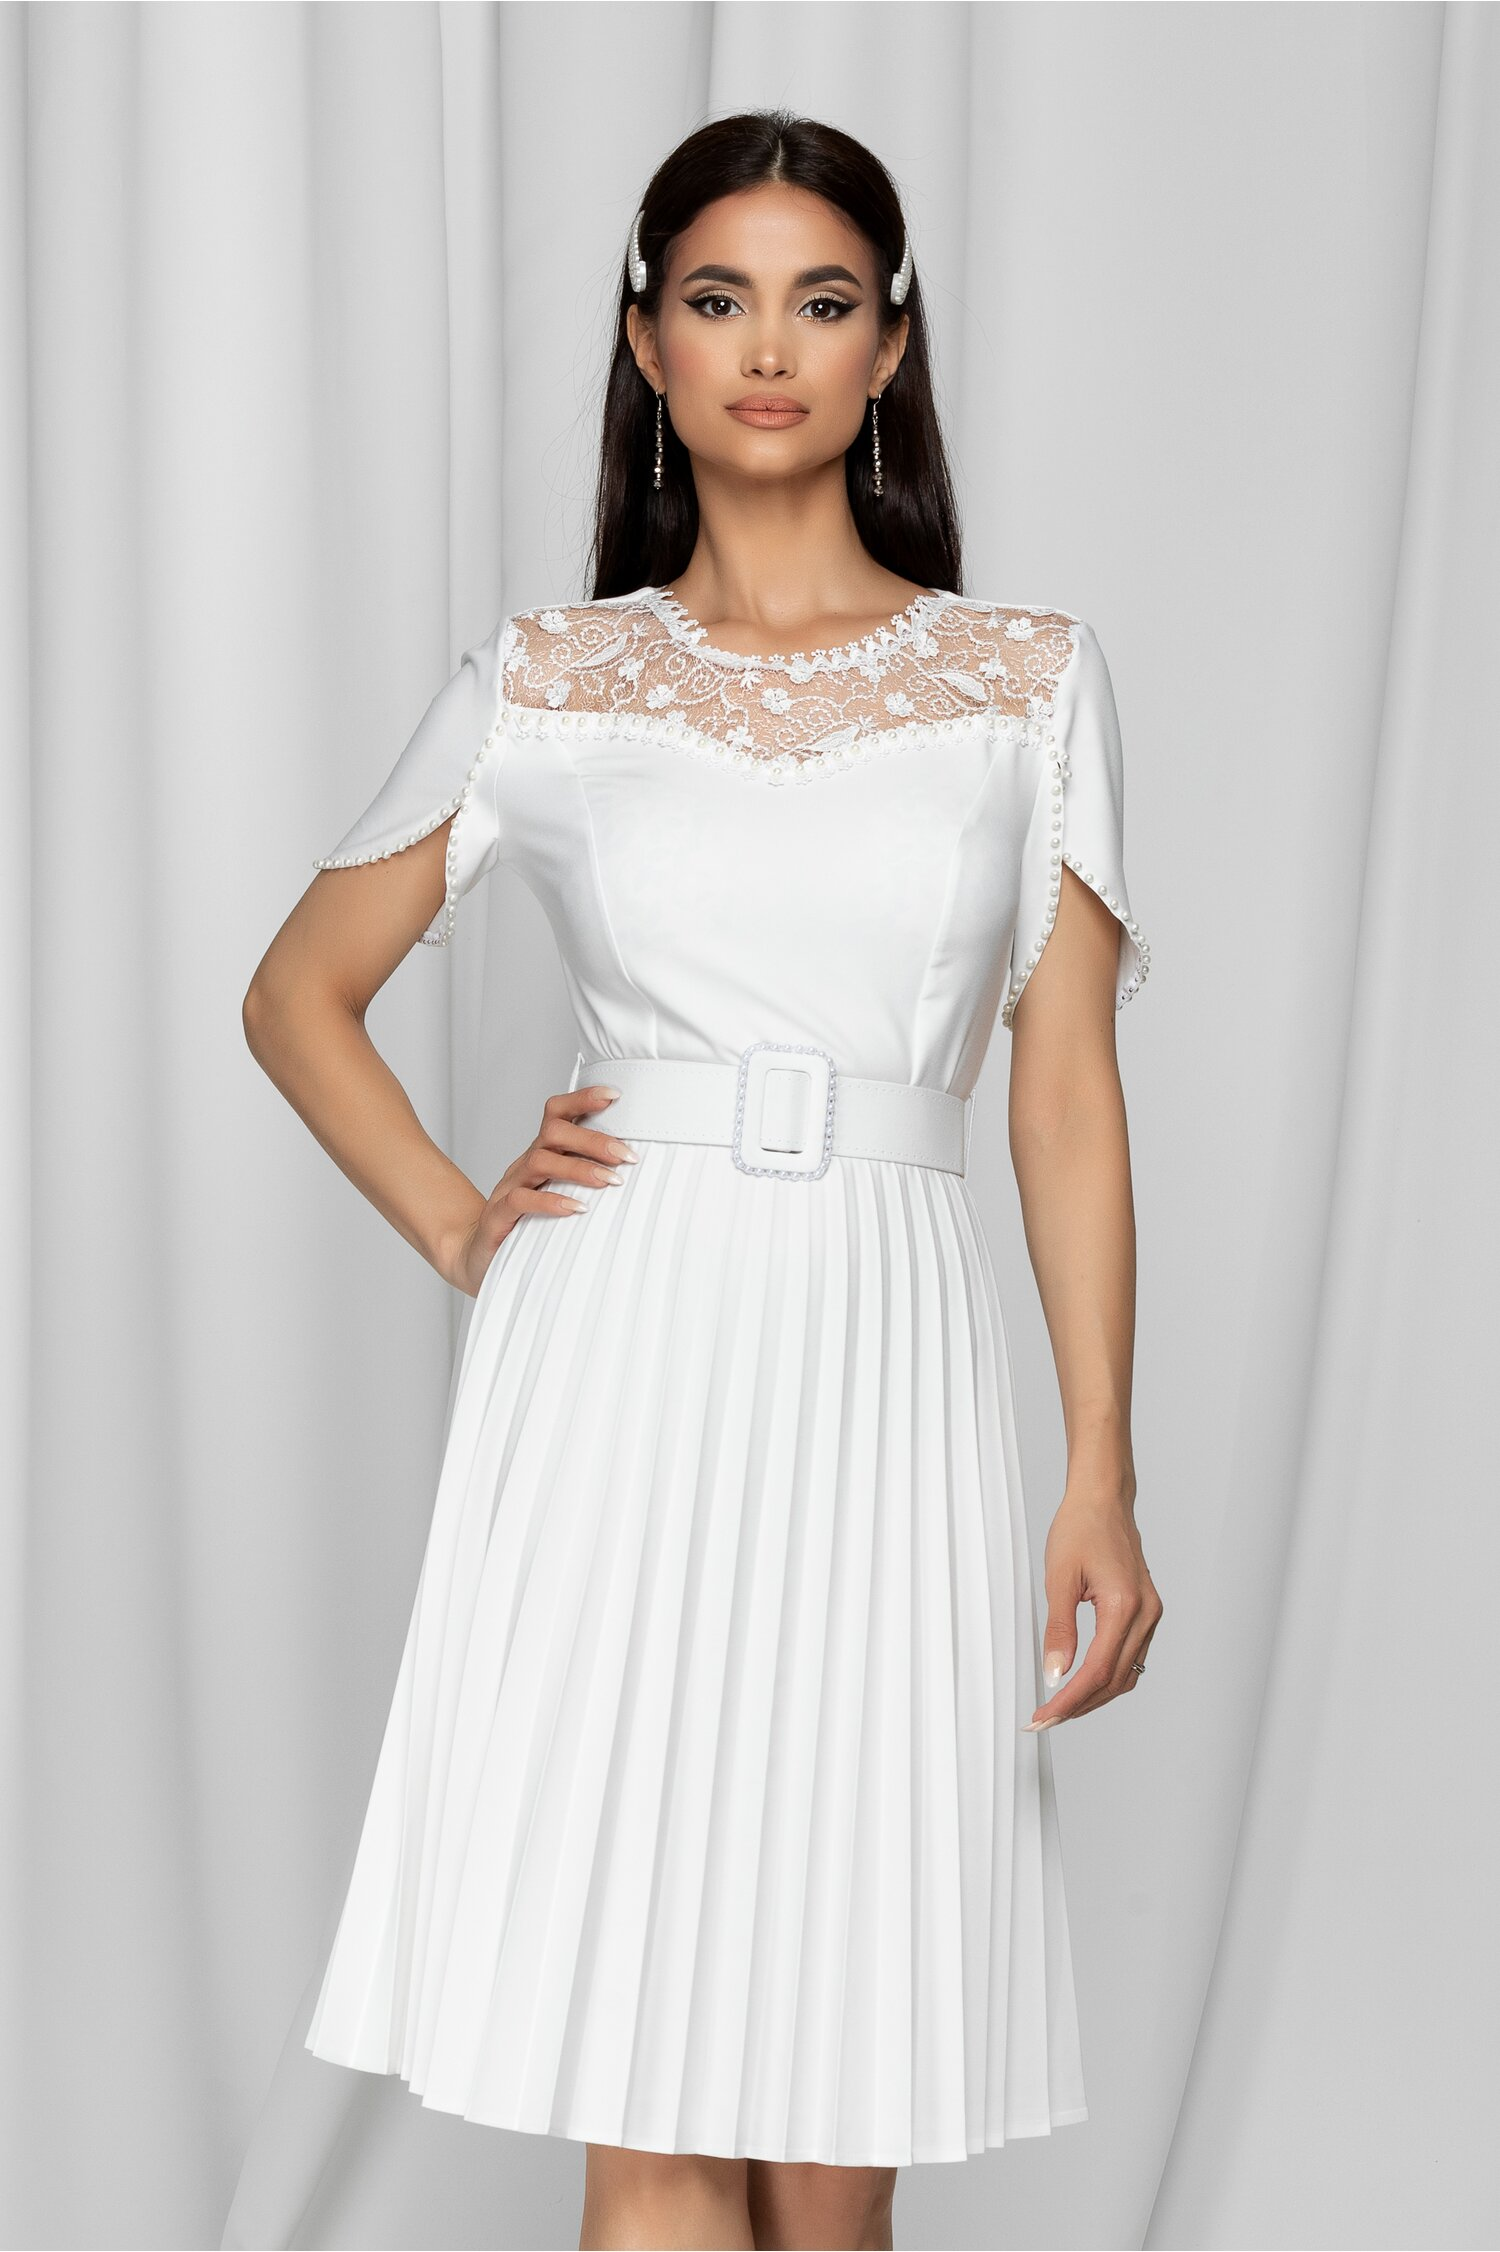 Rochie Tania alba cu dantela la bust si perlute in nuanta rochiei